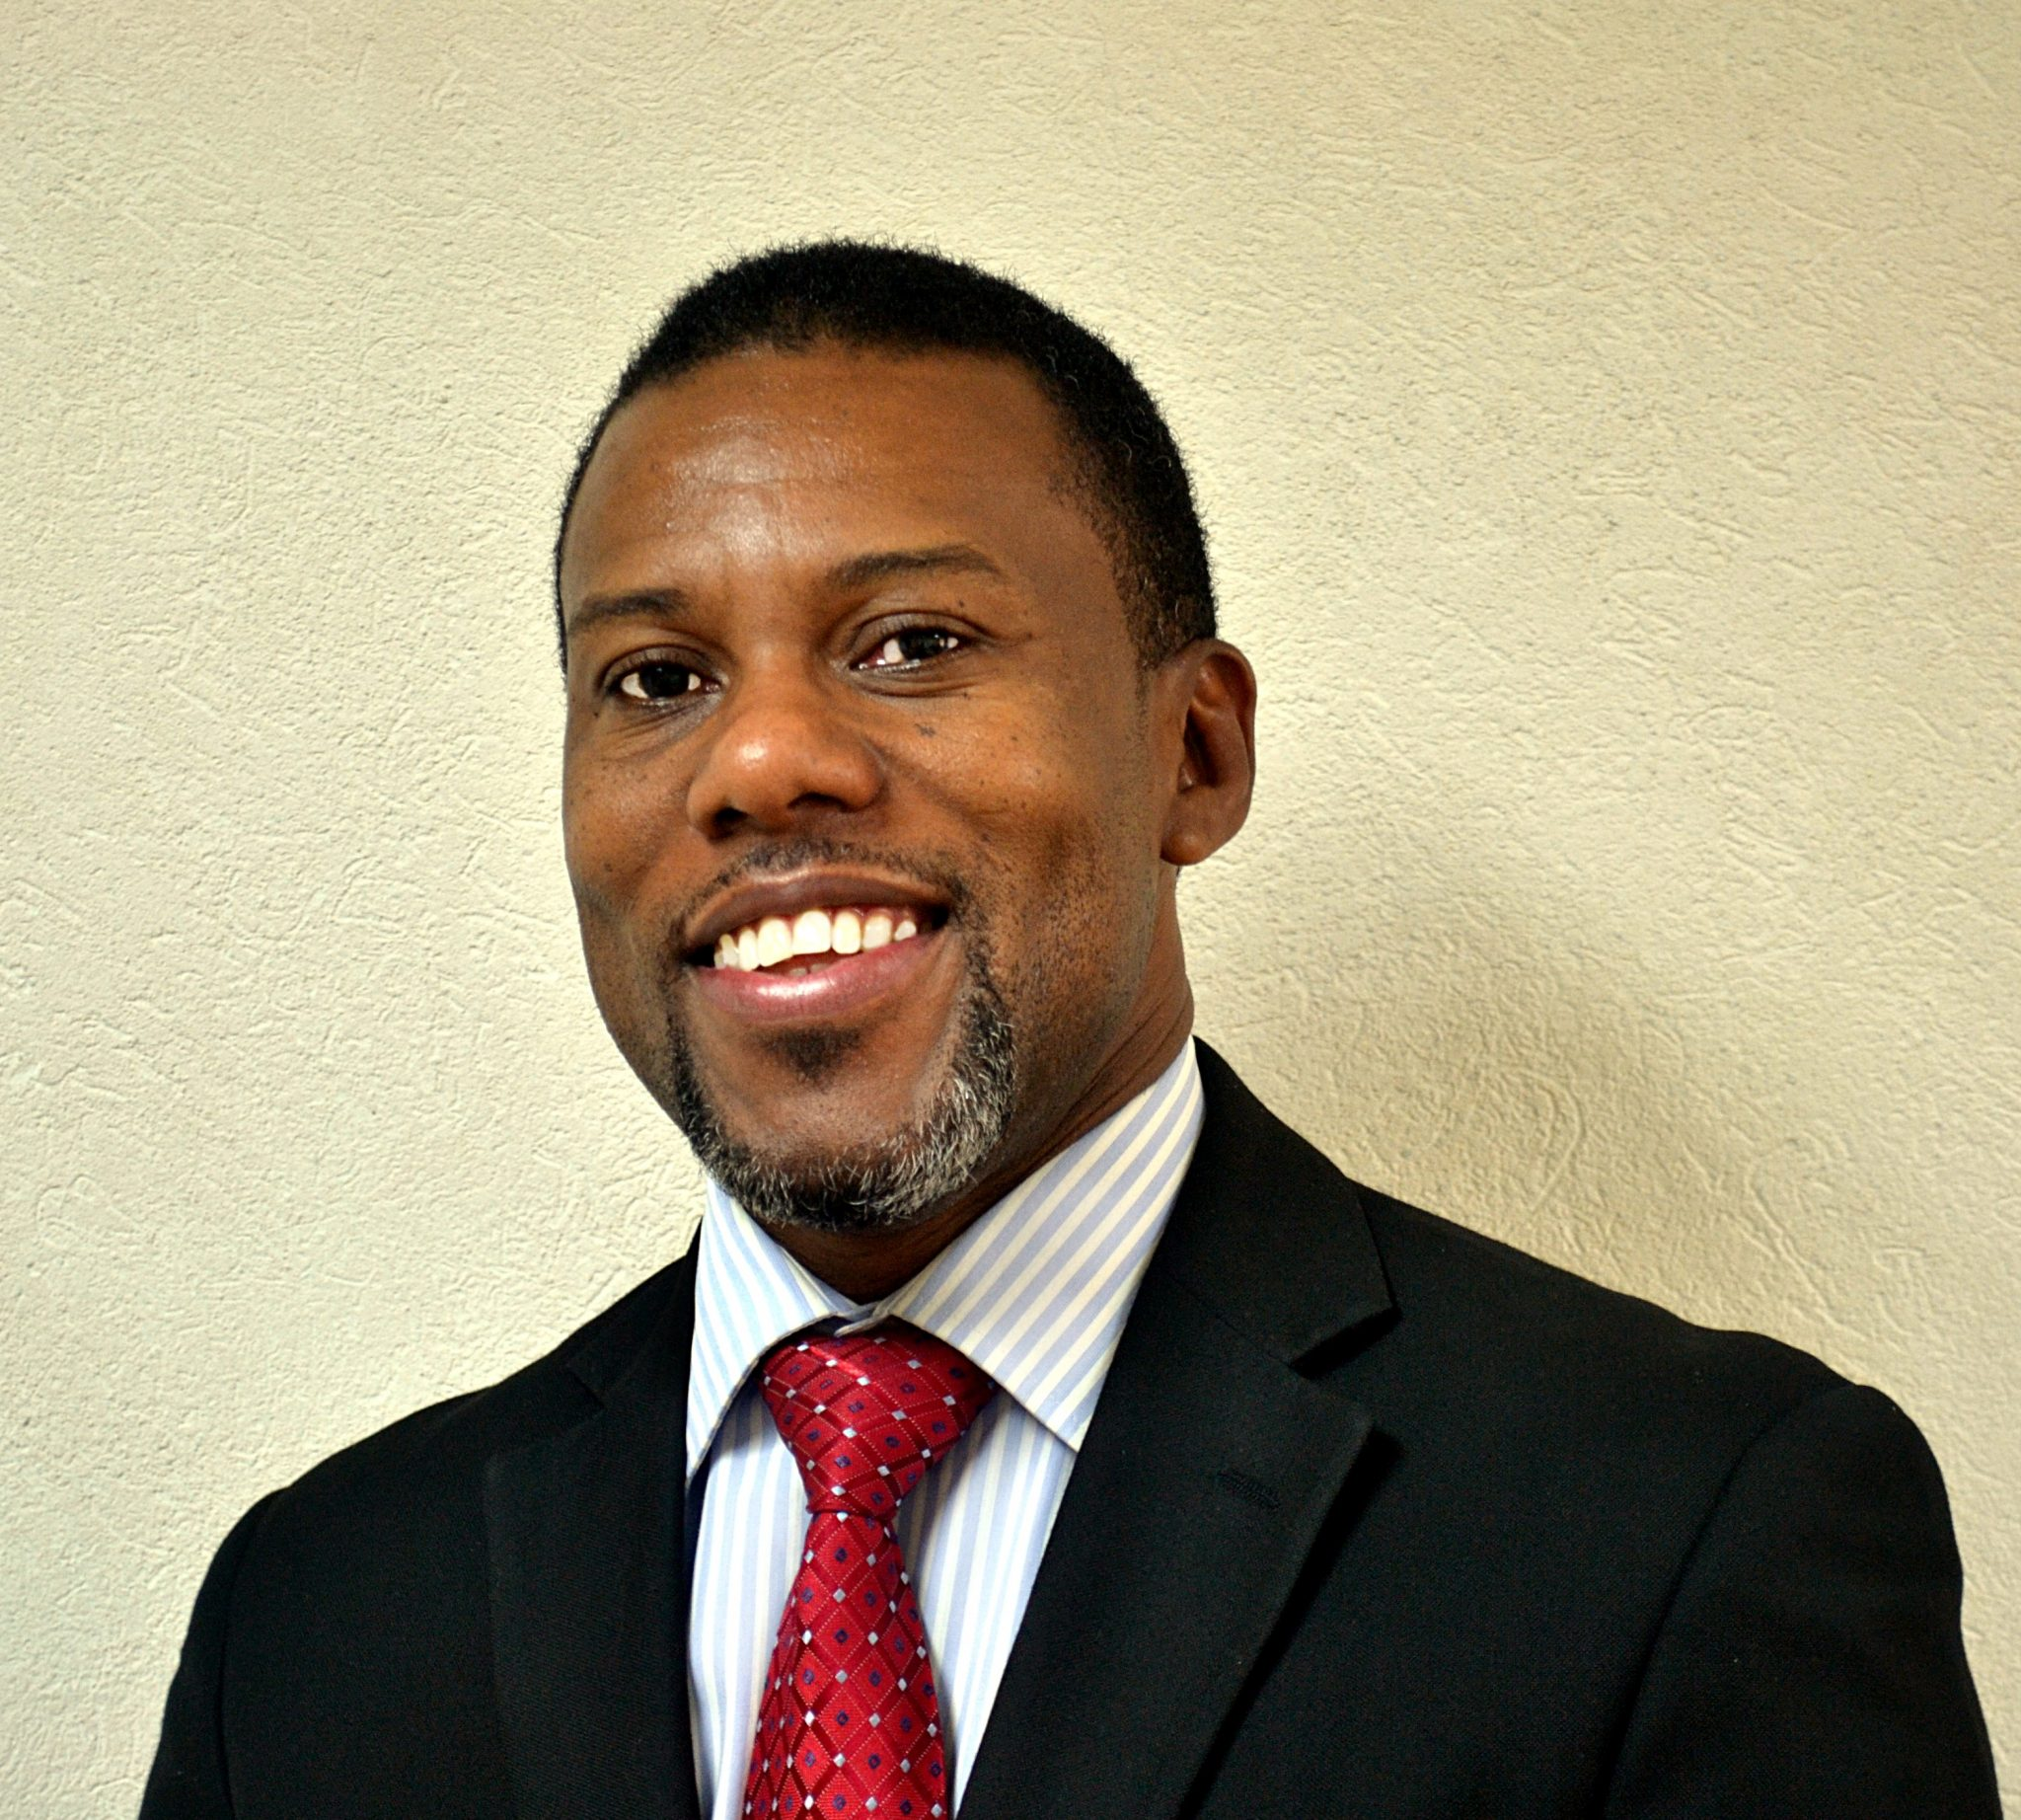 Mr Ronald Jackson, Executive Director of CDEMA